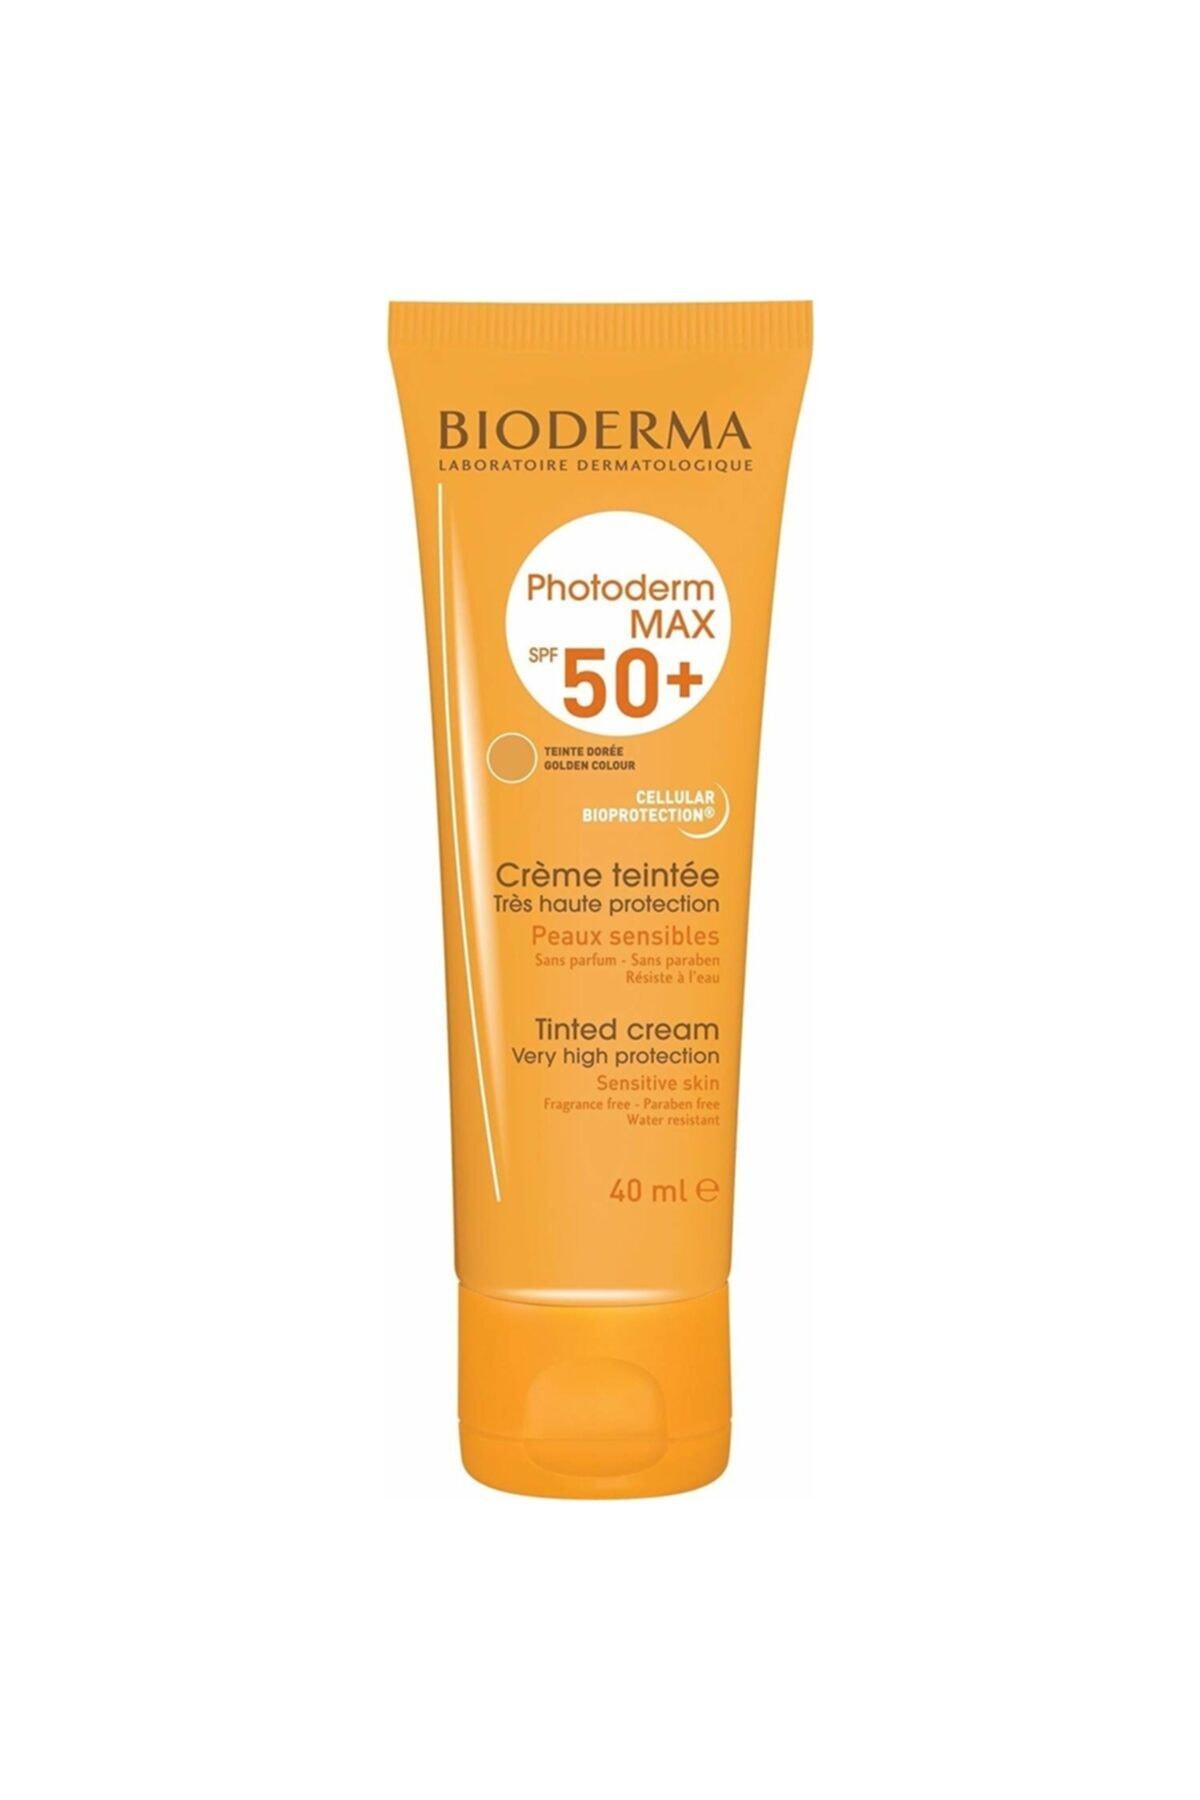 Bioderma Bıoderma Photoderm Max Tinted Cream 40 Ml (spf50+ Uva 38) 1